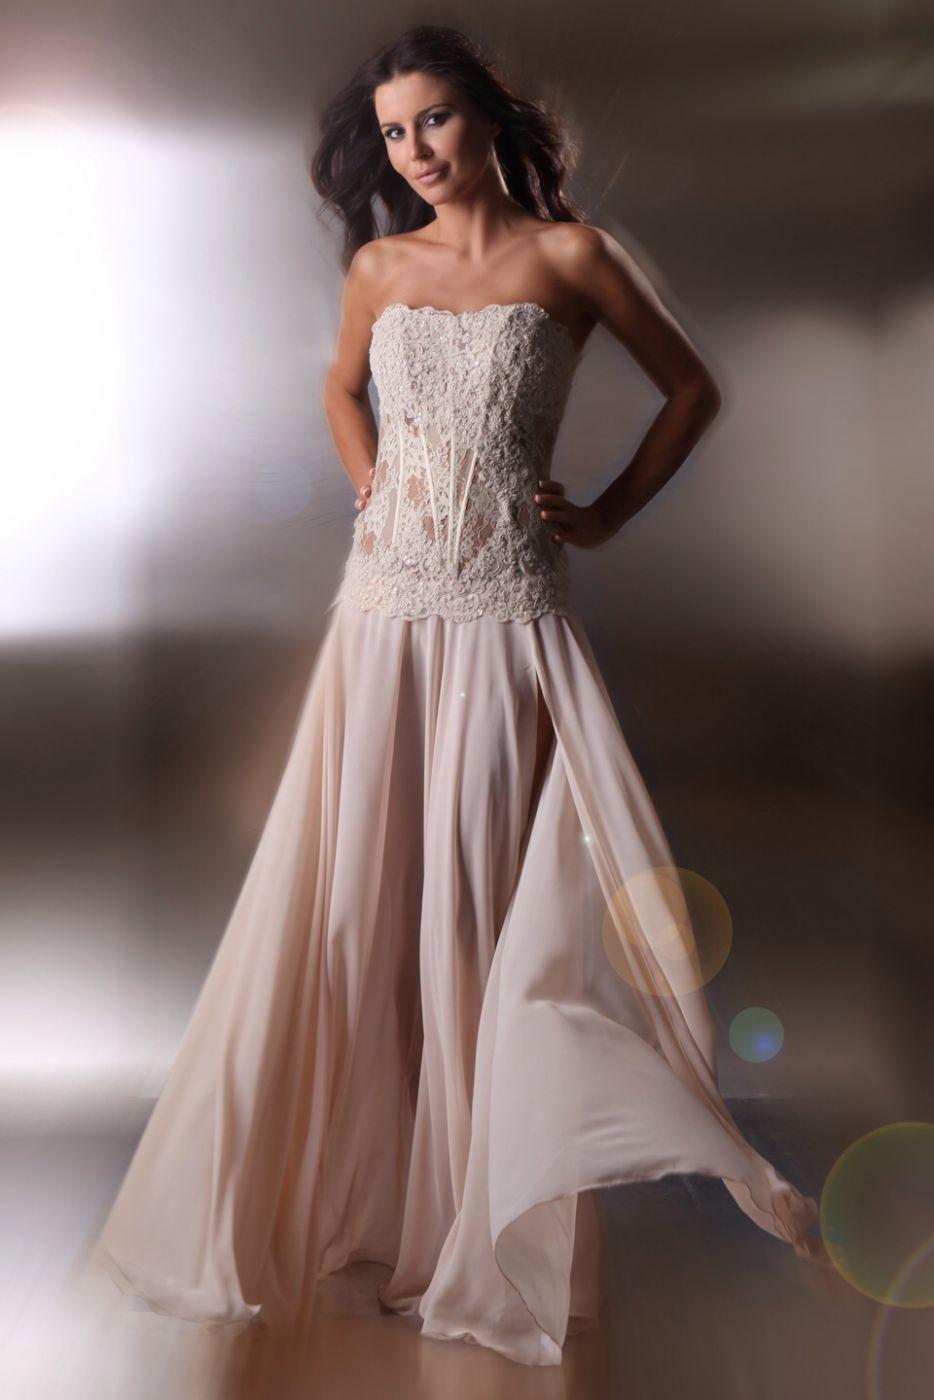 free shipping e7529 d1736 Designer Abendkleid aus Spitze & Chiffon beige creme nude ...